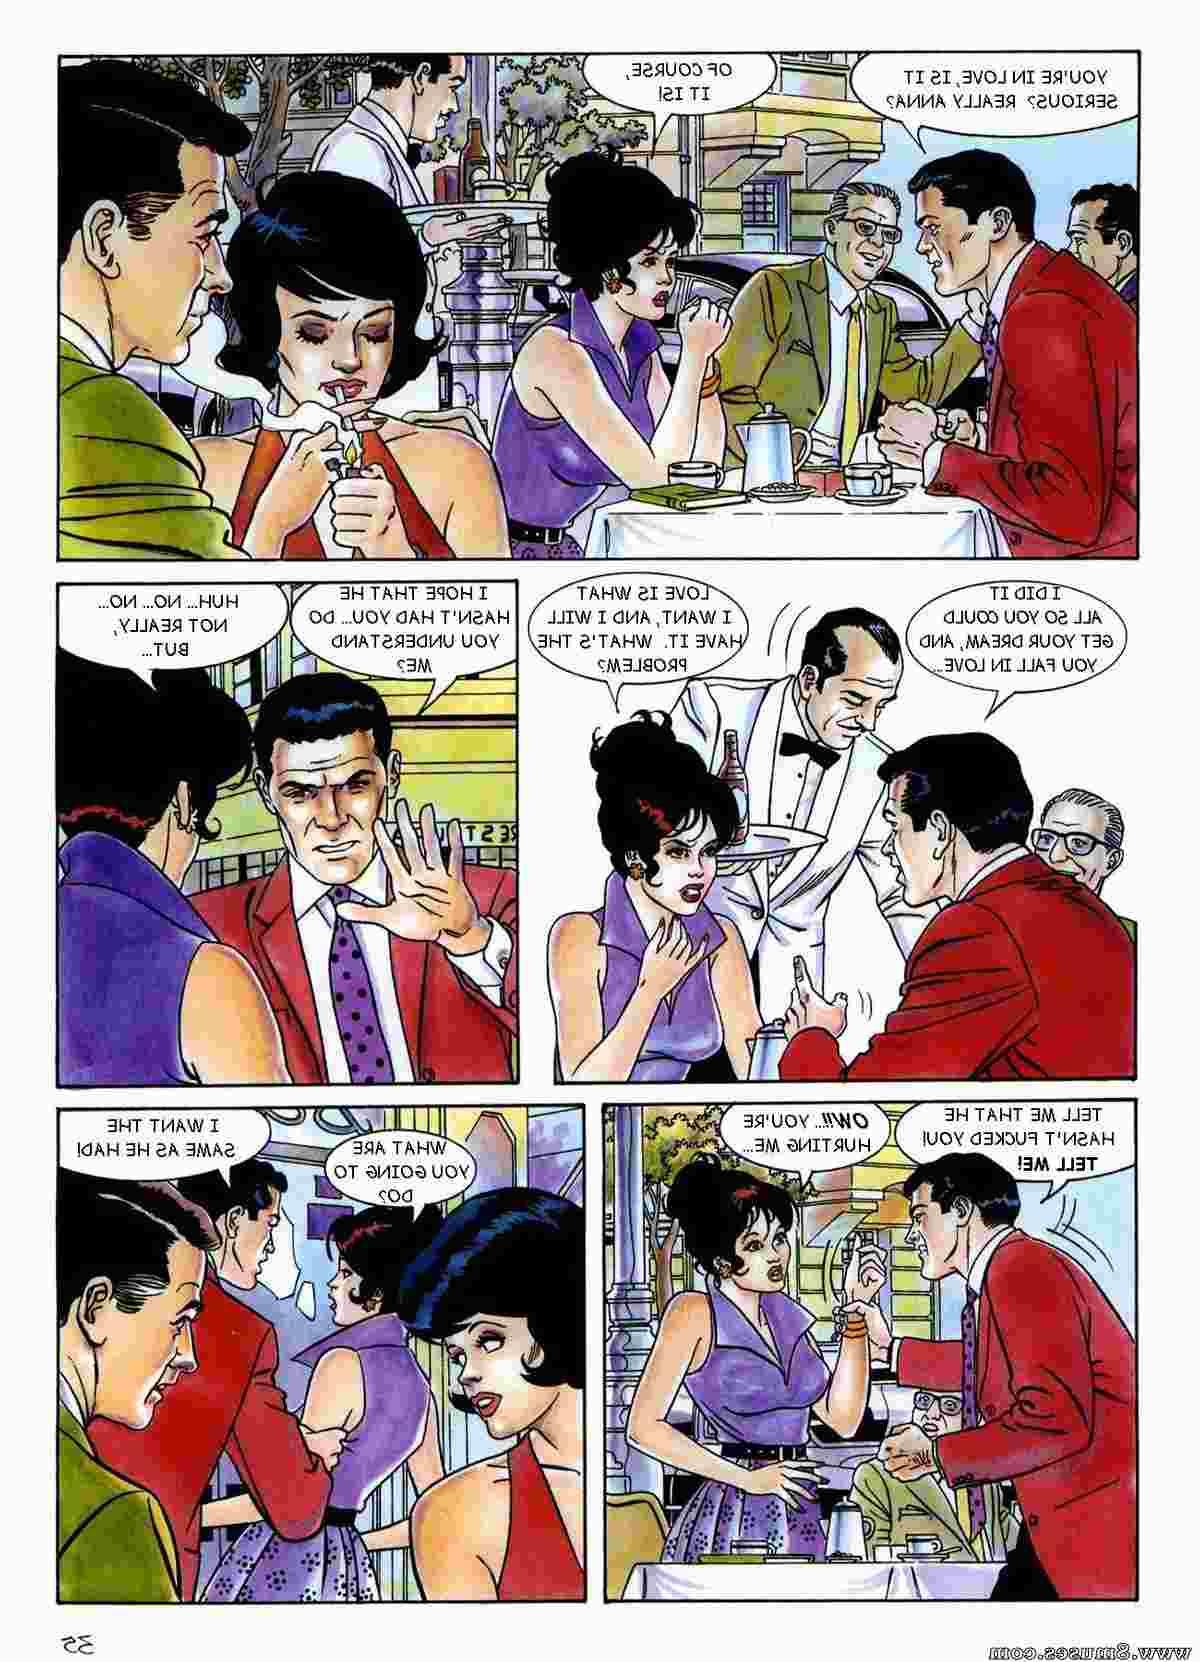 Stramaglia-Morale-Comics/Anna-Perverted-Innocence Anna_Perverted_Innocence__8muses_-_Sex_and_Porn_Comics_38.jpg